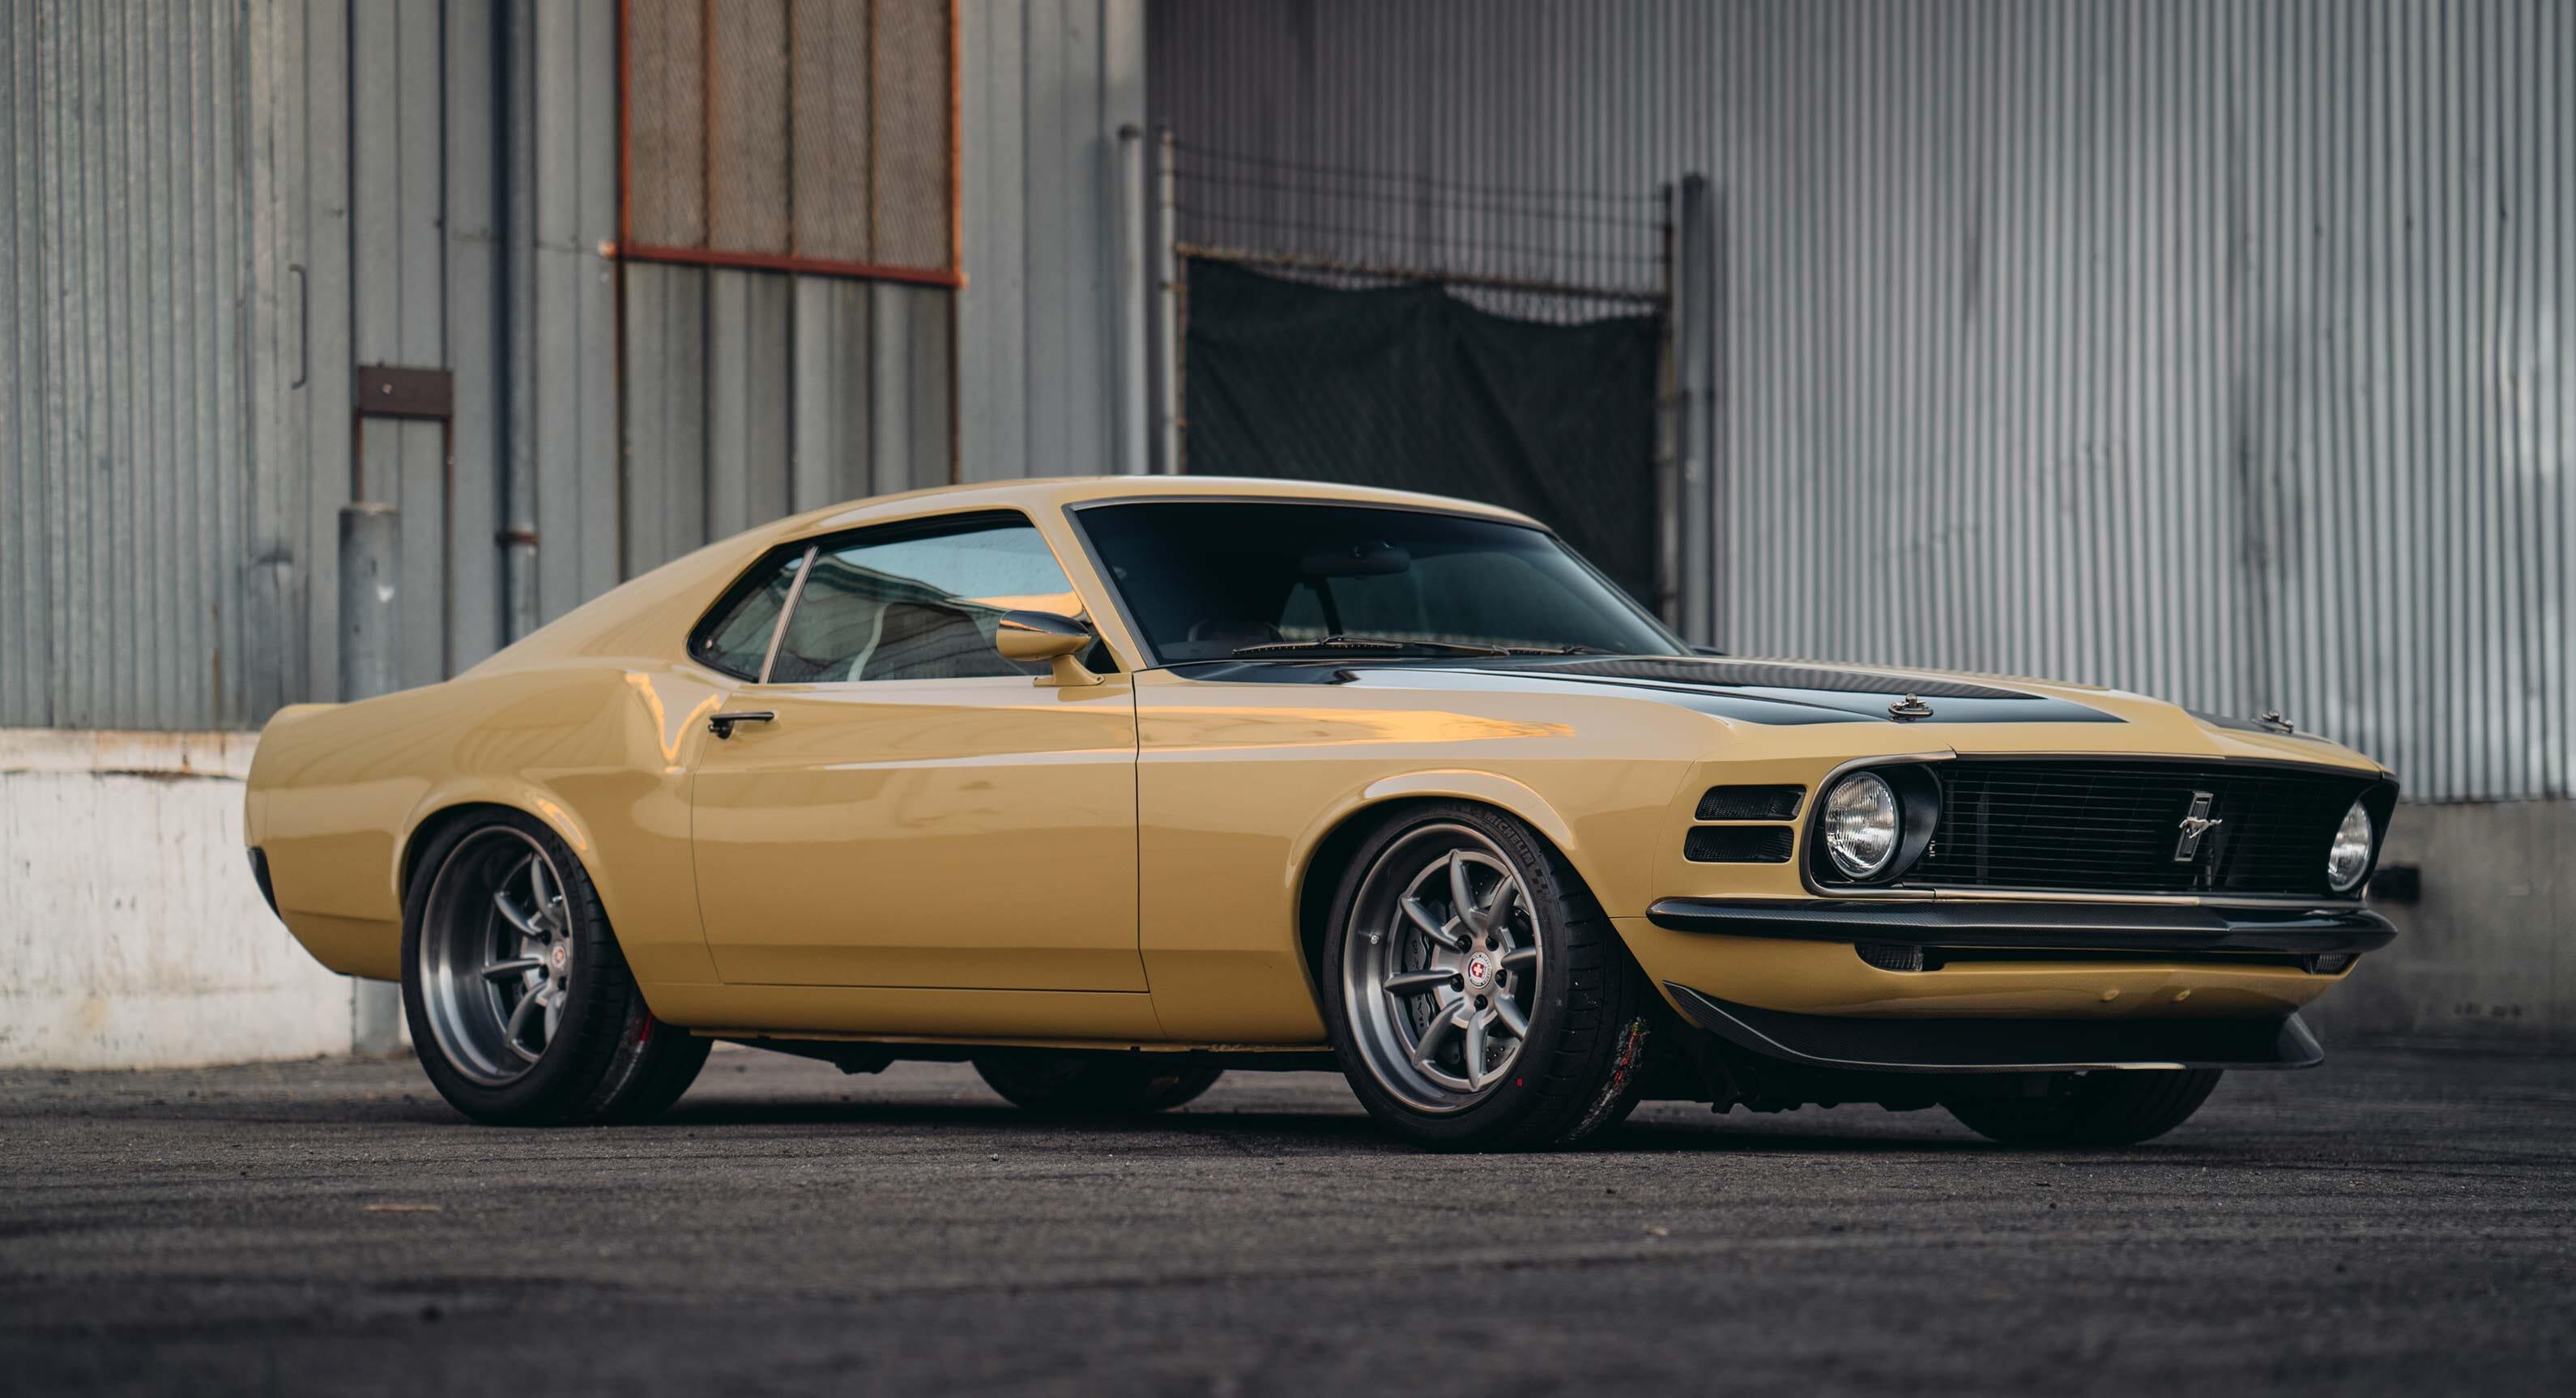 Check Out Robert Downey Jr.'s Custom Superhero 1970 Ford Mustang